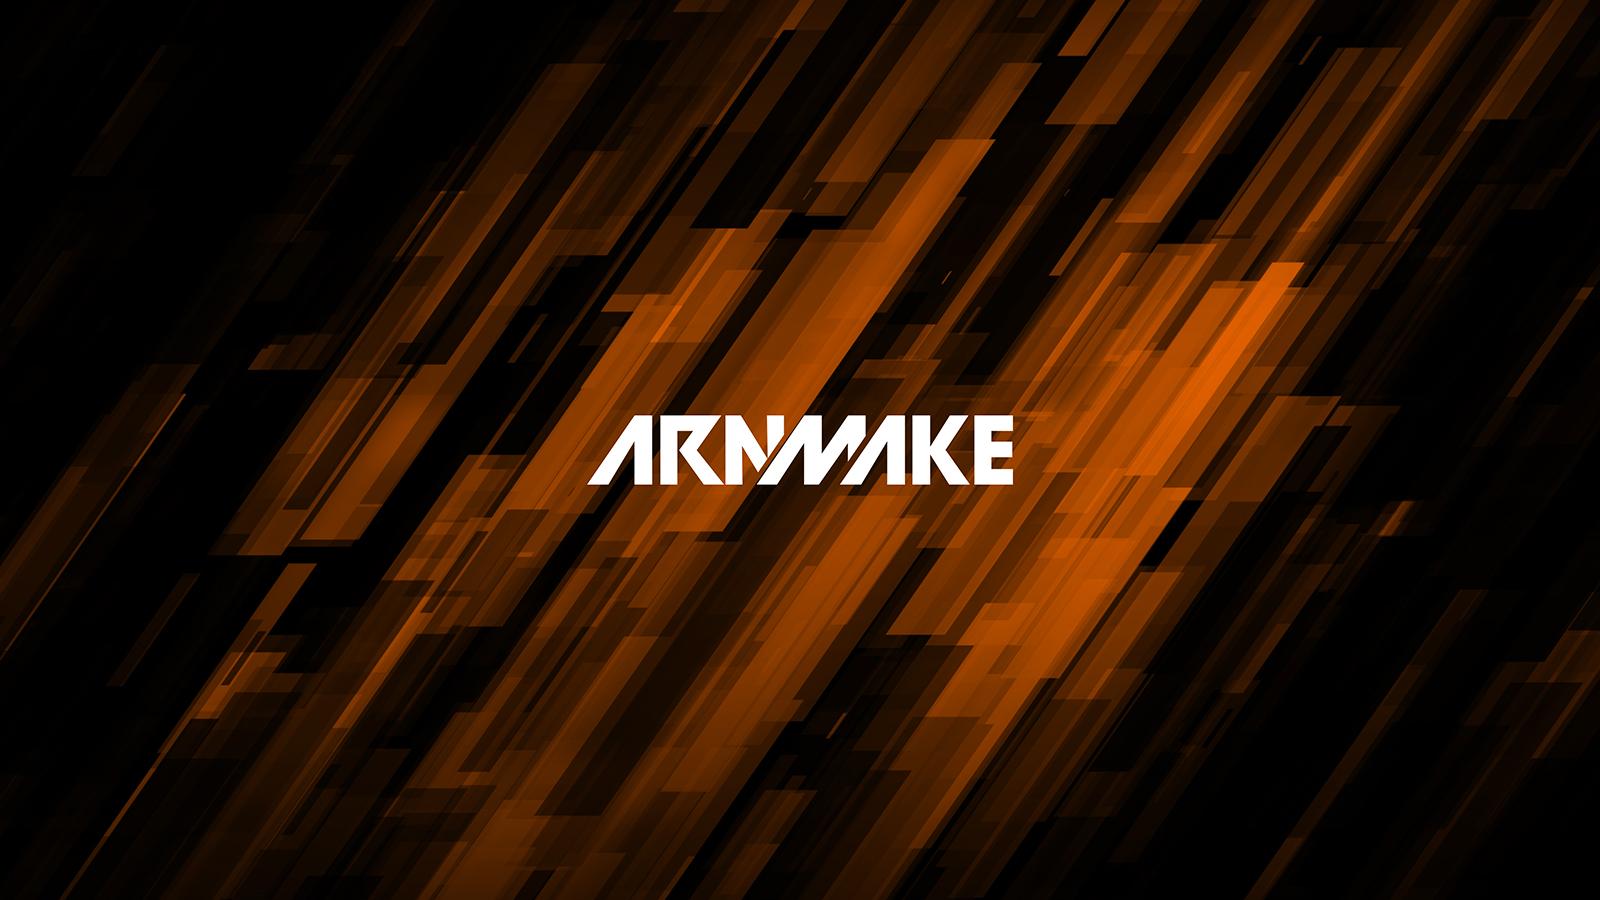 Arnmake Background.jpg